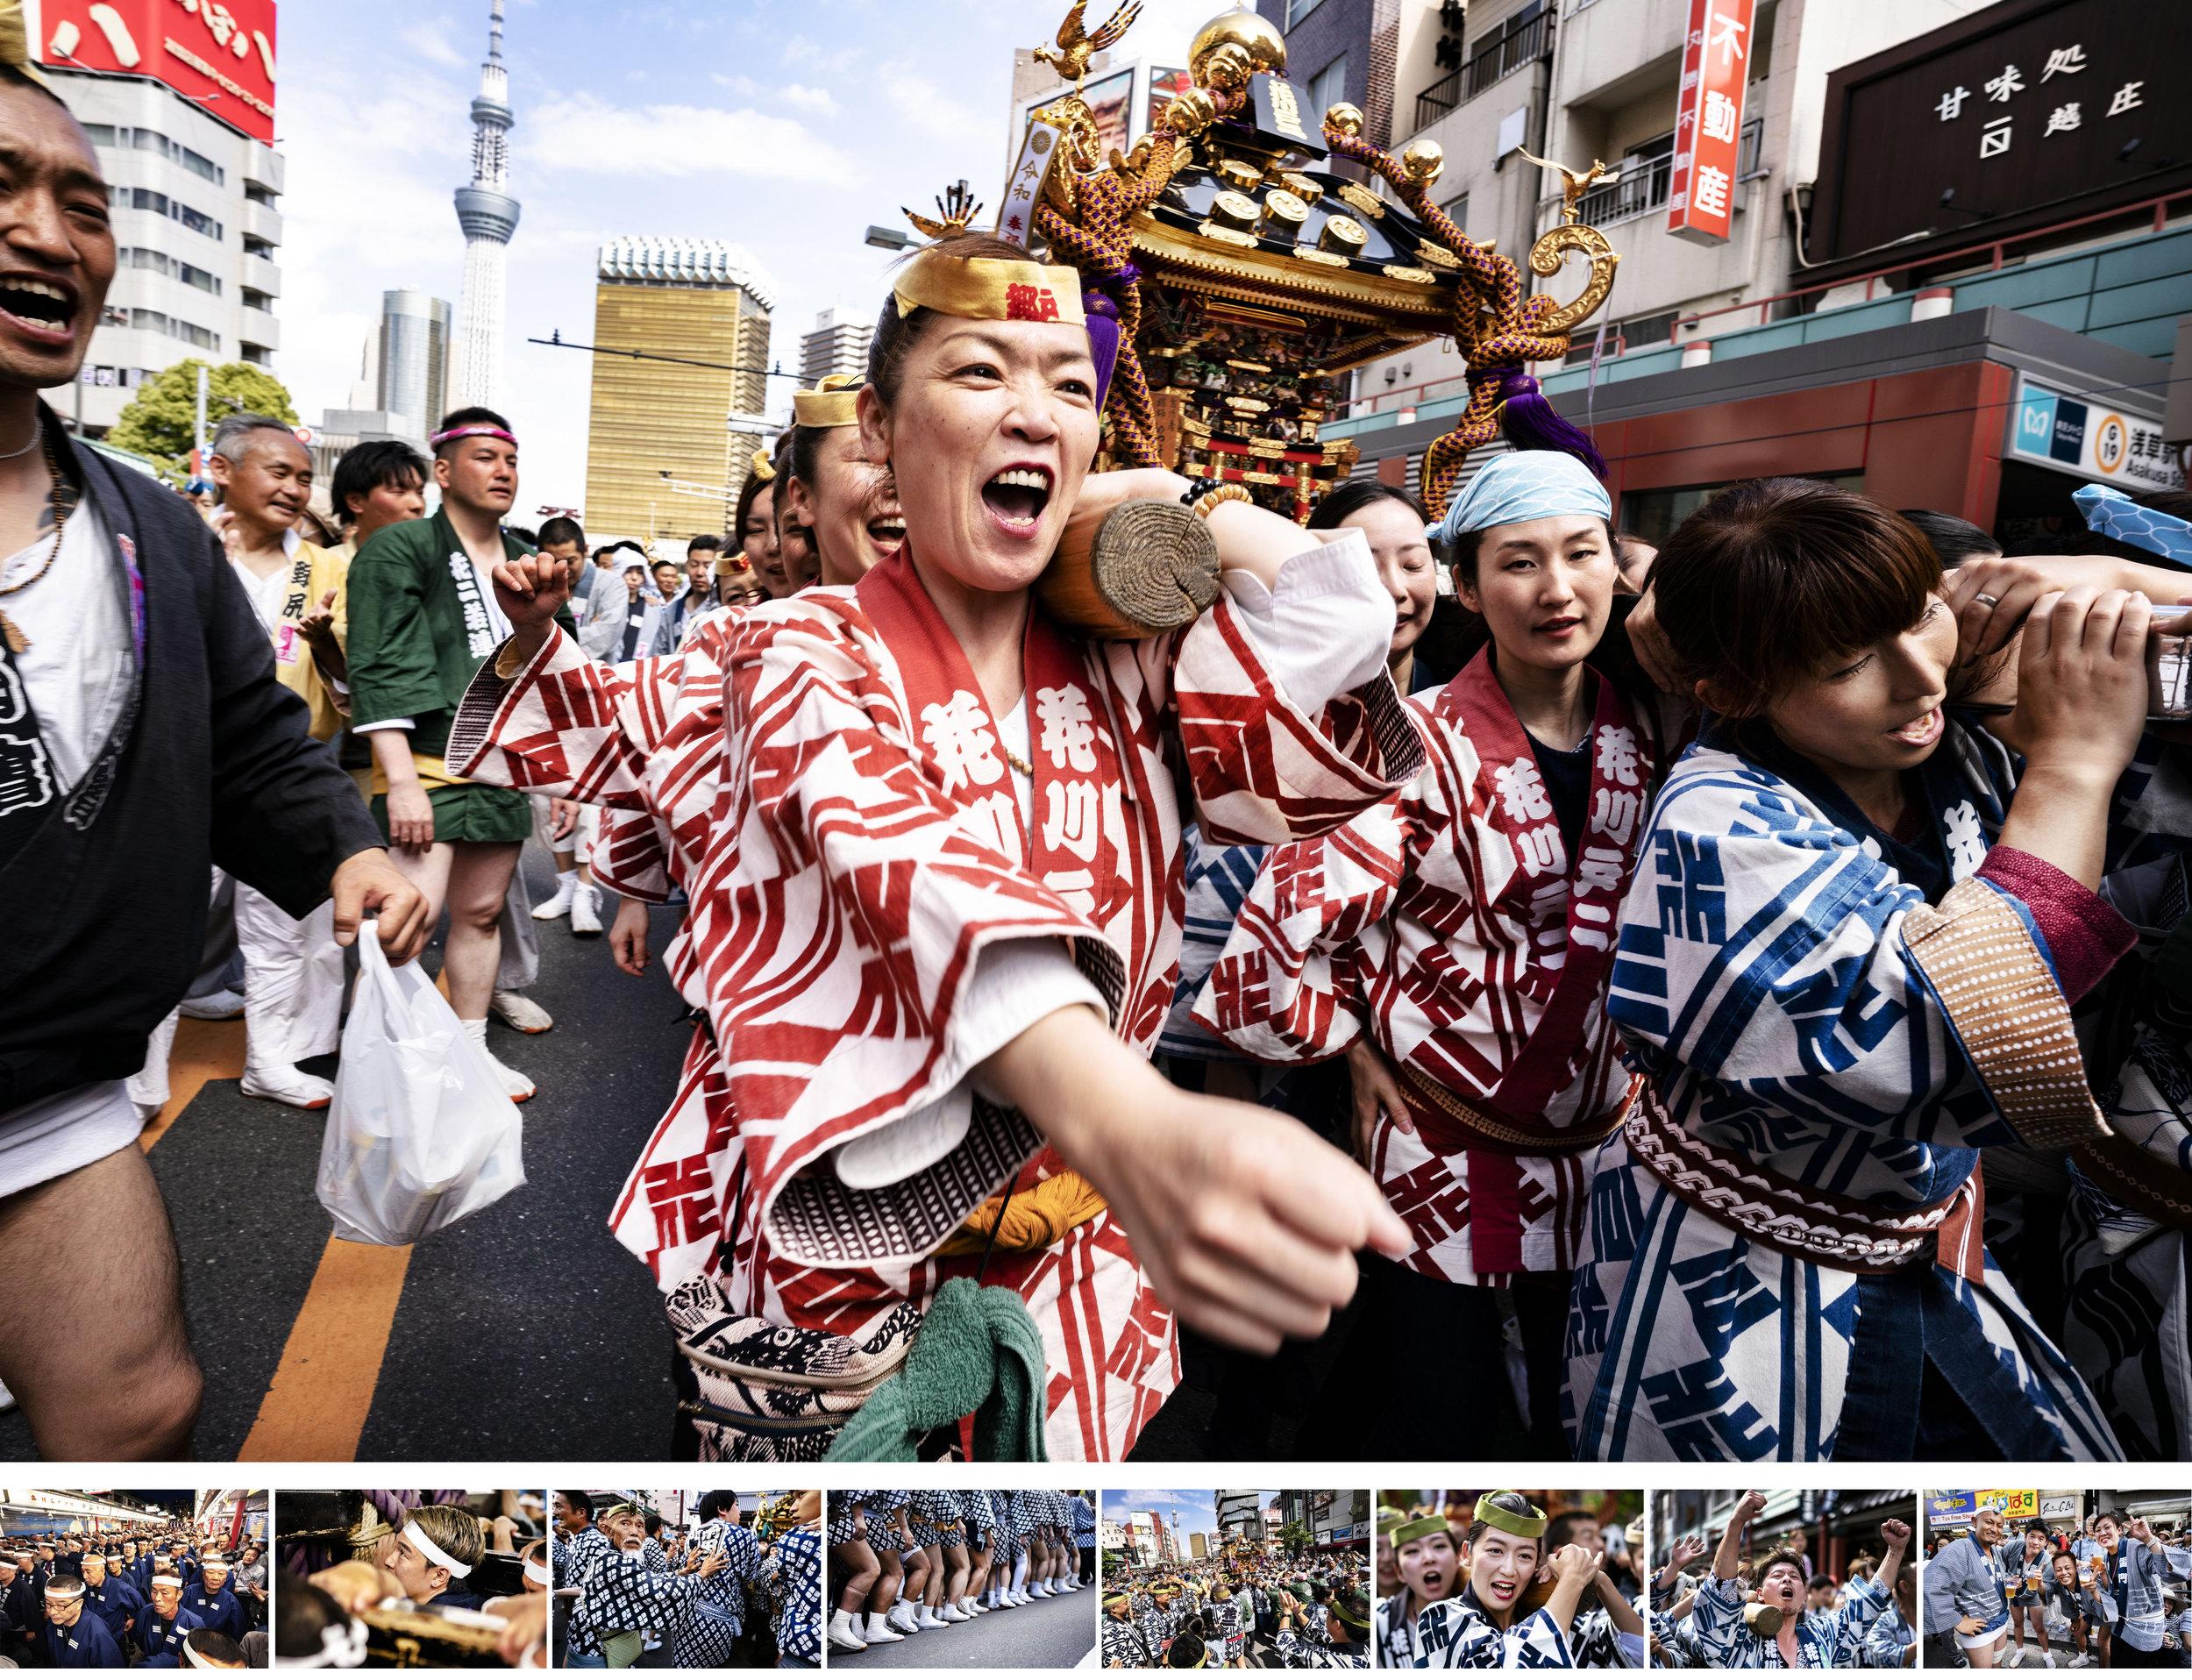 "Sanja Matsuri - フォト・ドキュメンタリー制作物:スチール""Sanja Matsuri=三社祭り""は浅草で毎年行われるお祭りを記録したシリーズ写真。浅草寺境内に隣接する浅草神社の祭神として祀られる三人の漁師に因んだ祭りとされる三社祭は、神霊を鎮めた約100基もの神輿が通りを練り歩き、地元の商売や住人に幸運を分け与えるとして知られている。"